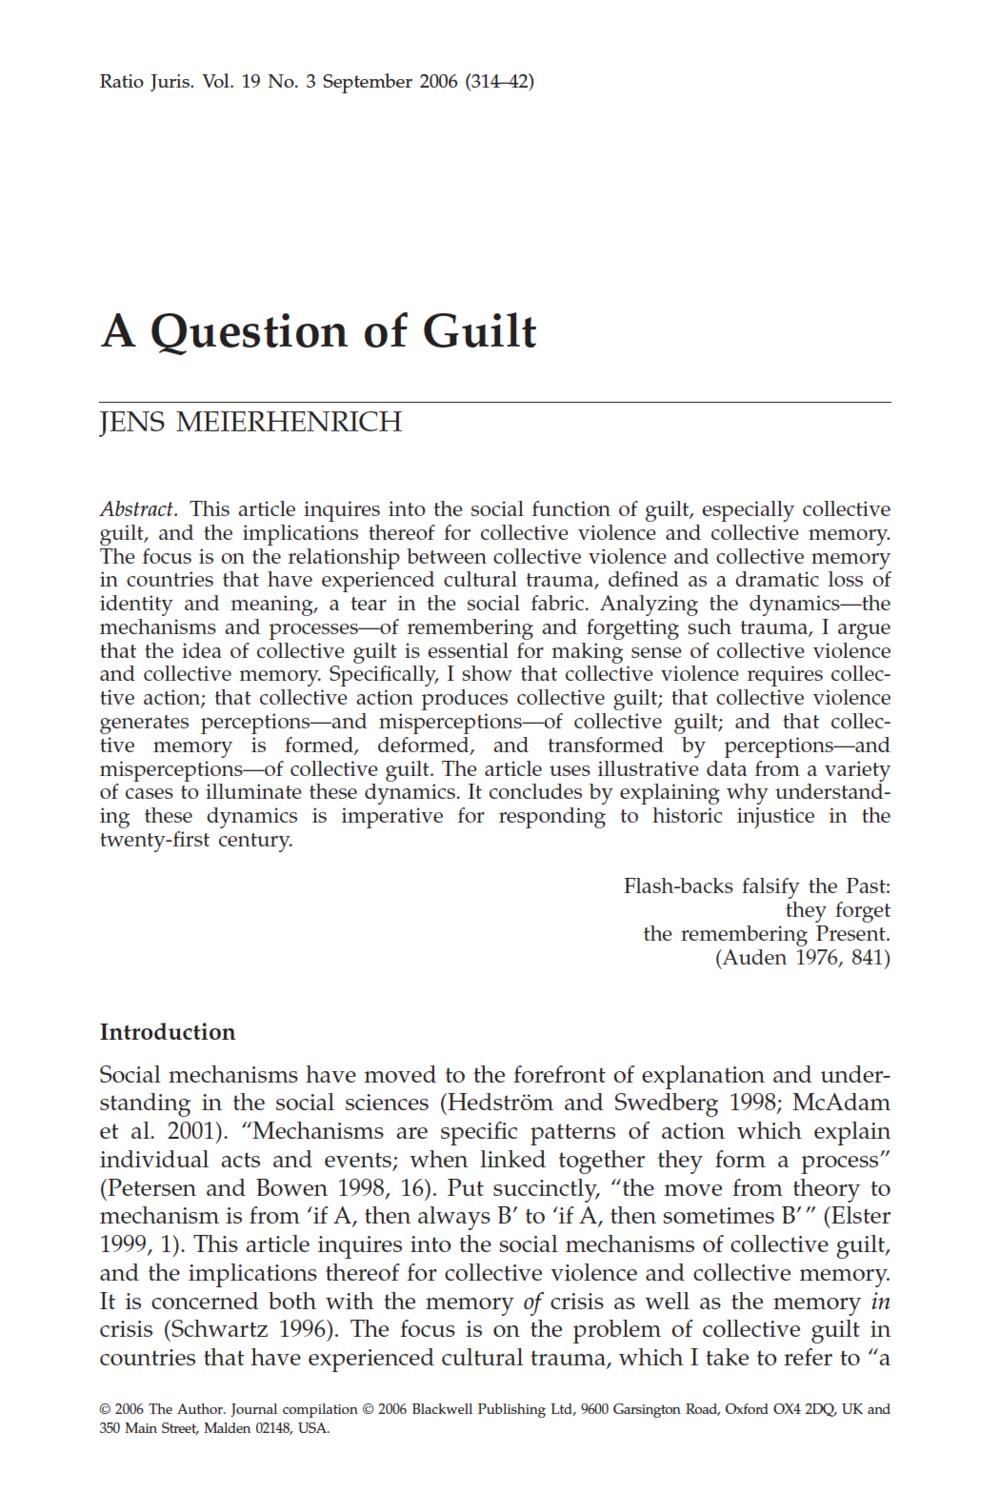 [10] Screen Shot, A Question of Guilt [2006].png